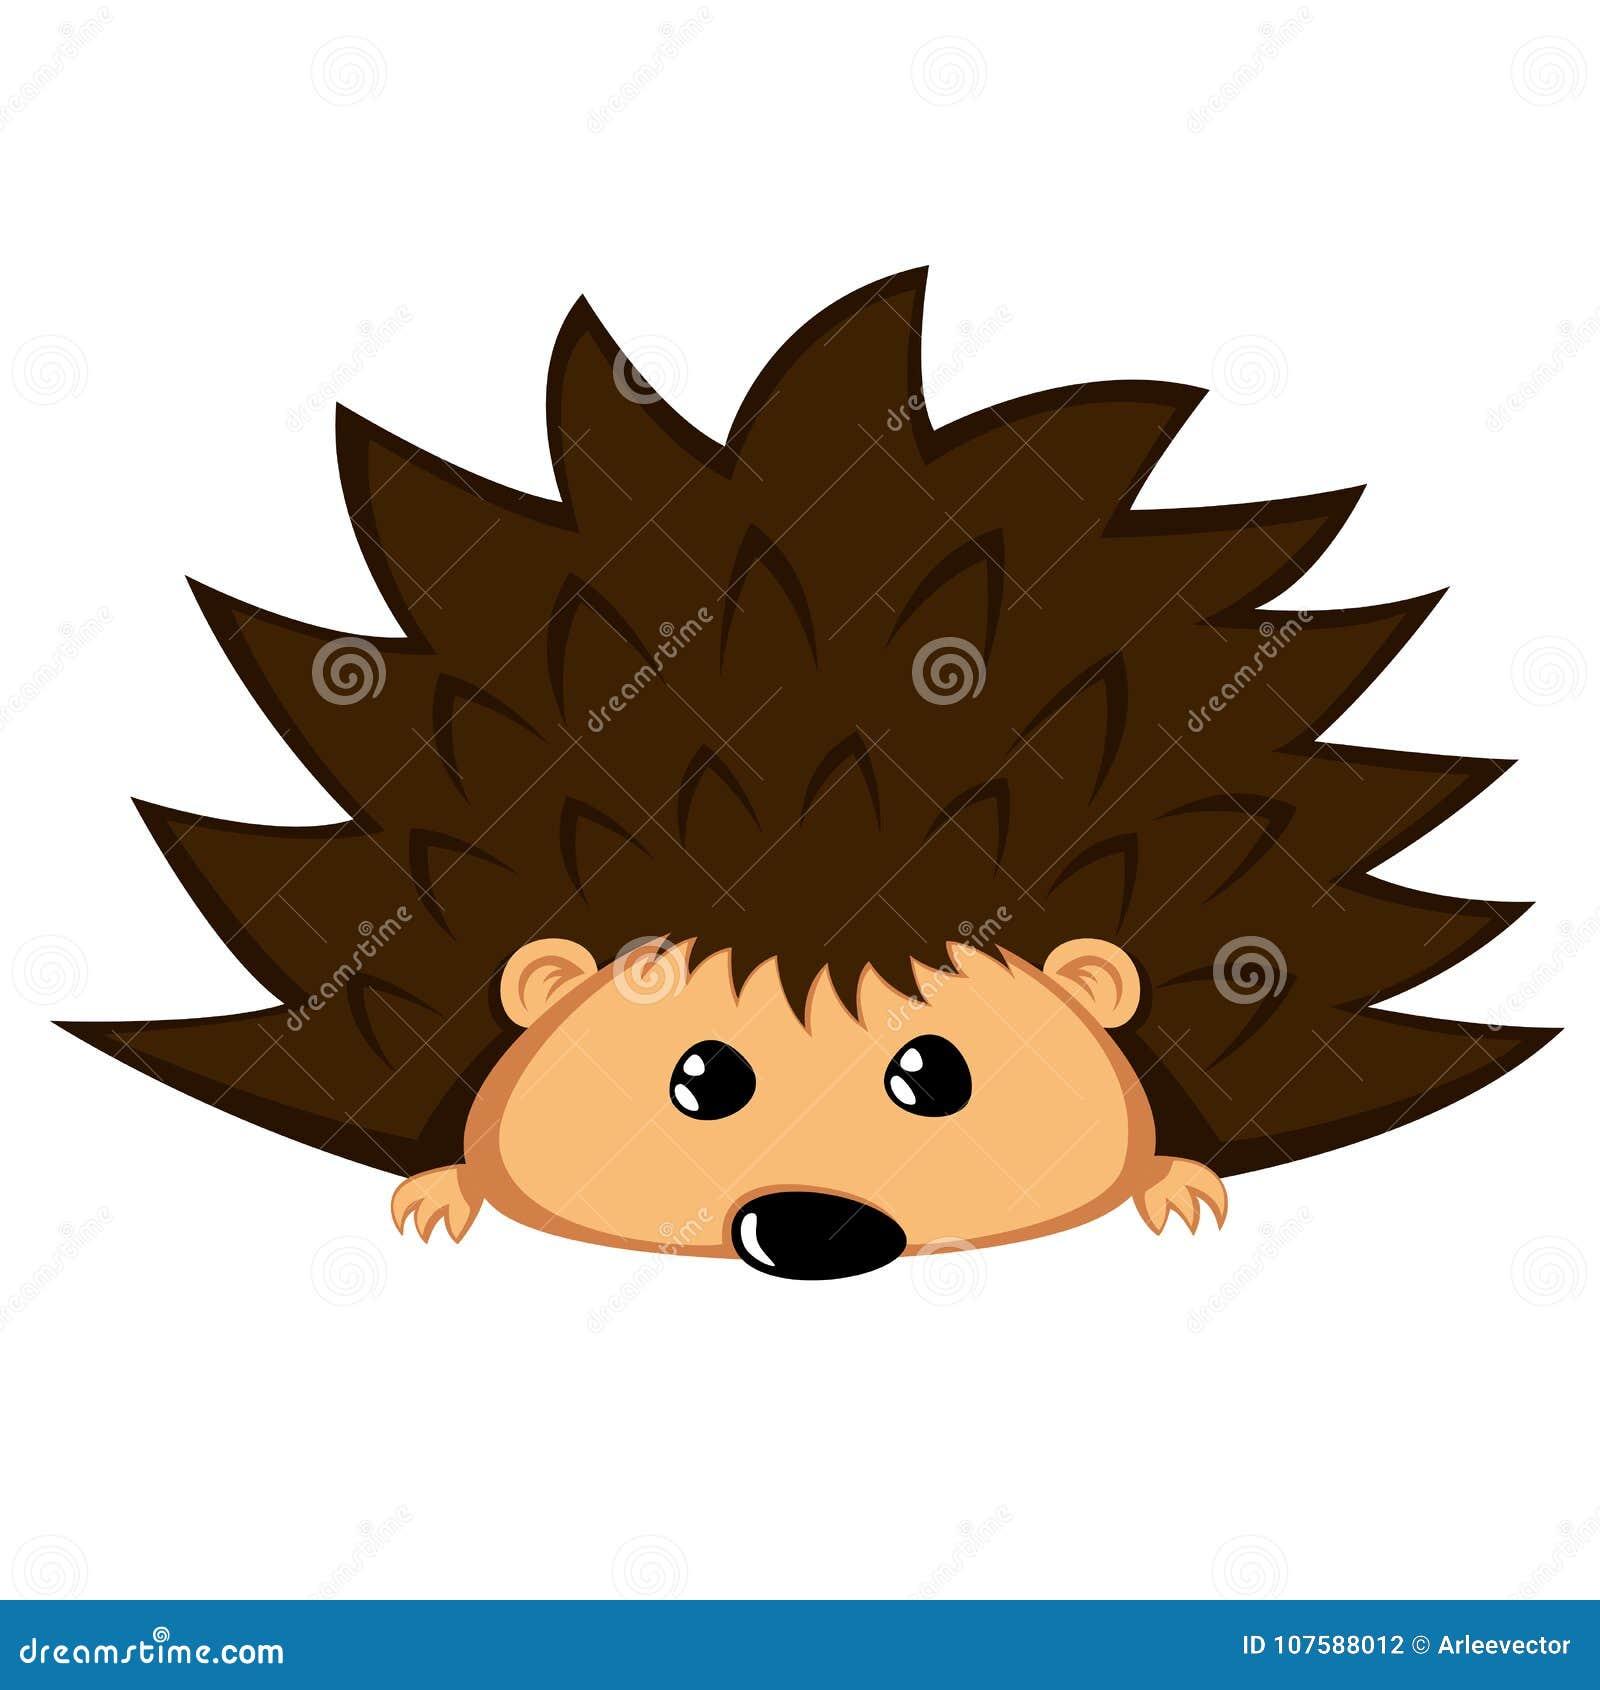 Lovely hedgehog - cute animal with begging eyes